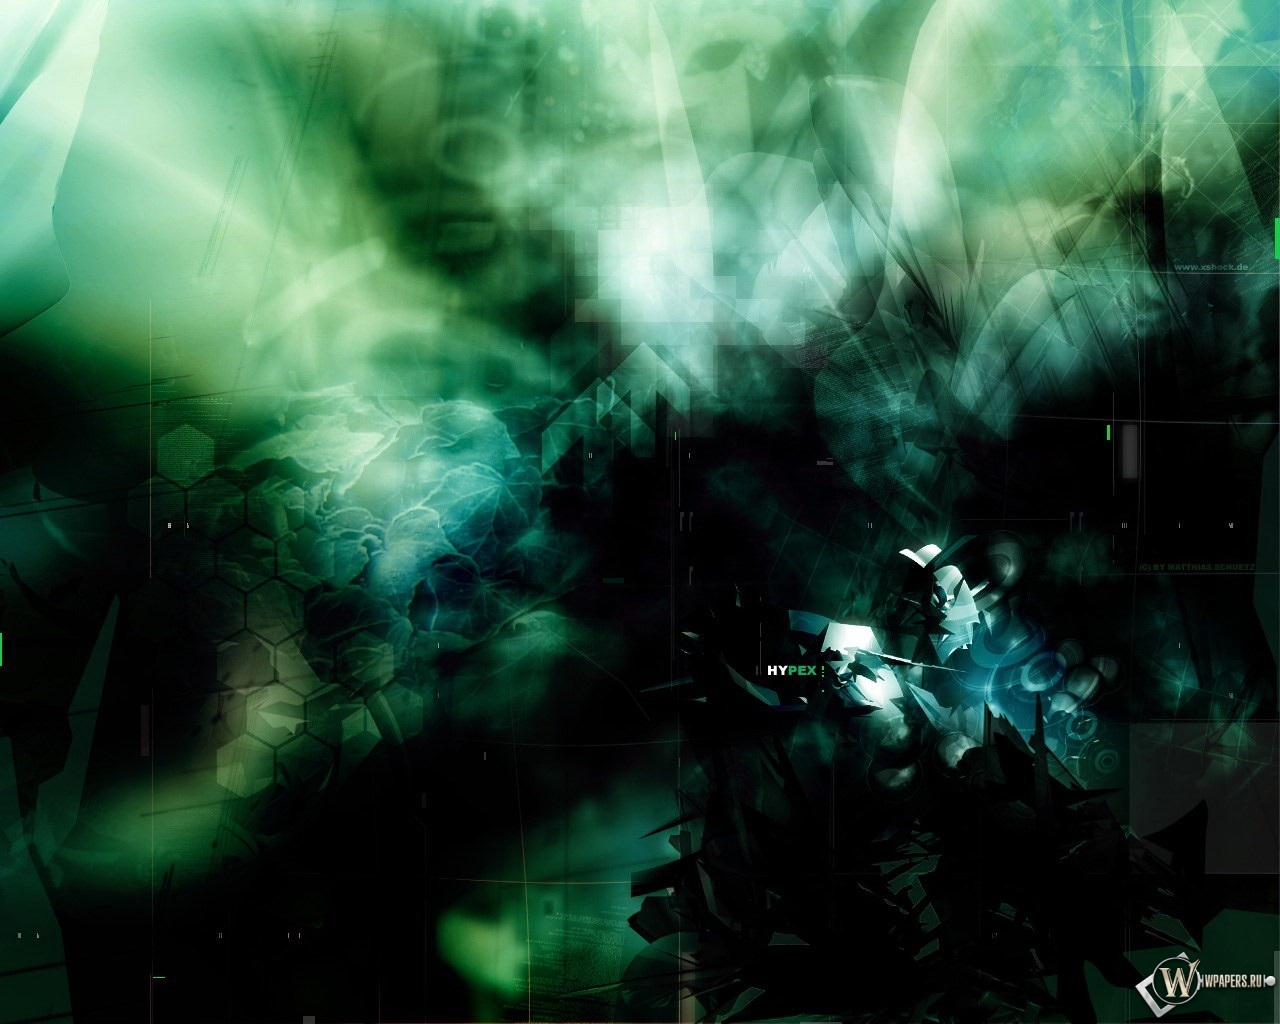 Зеленая абстракция 1280x1024